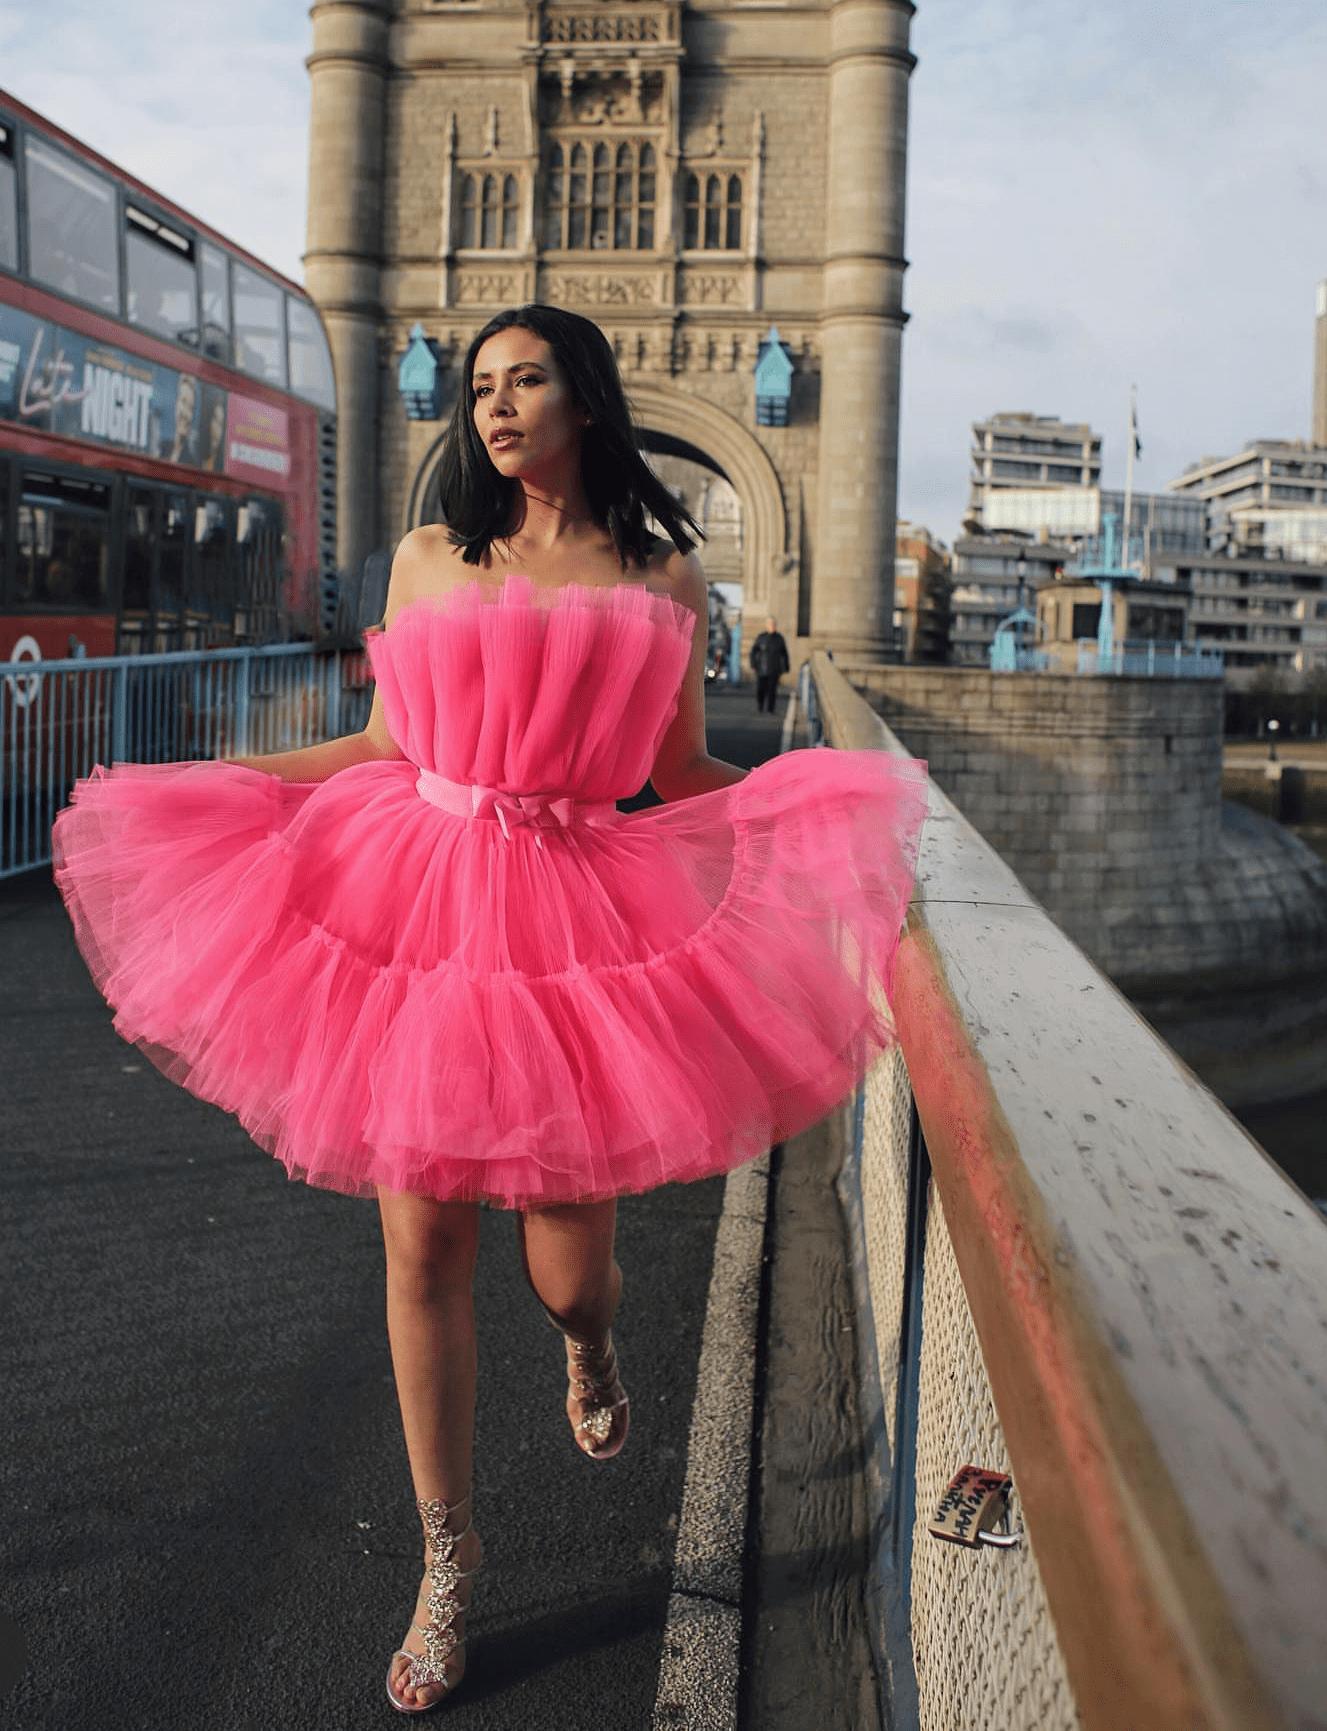 Giambattista Valli Pink Flared Tulle Dress Size 10 The Volte